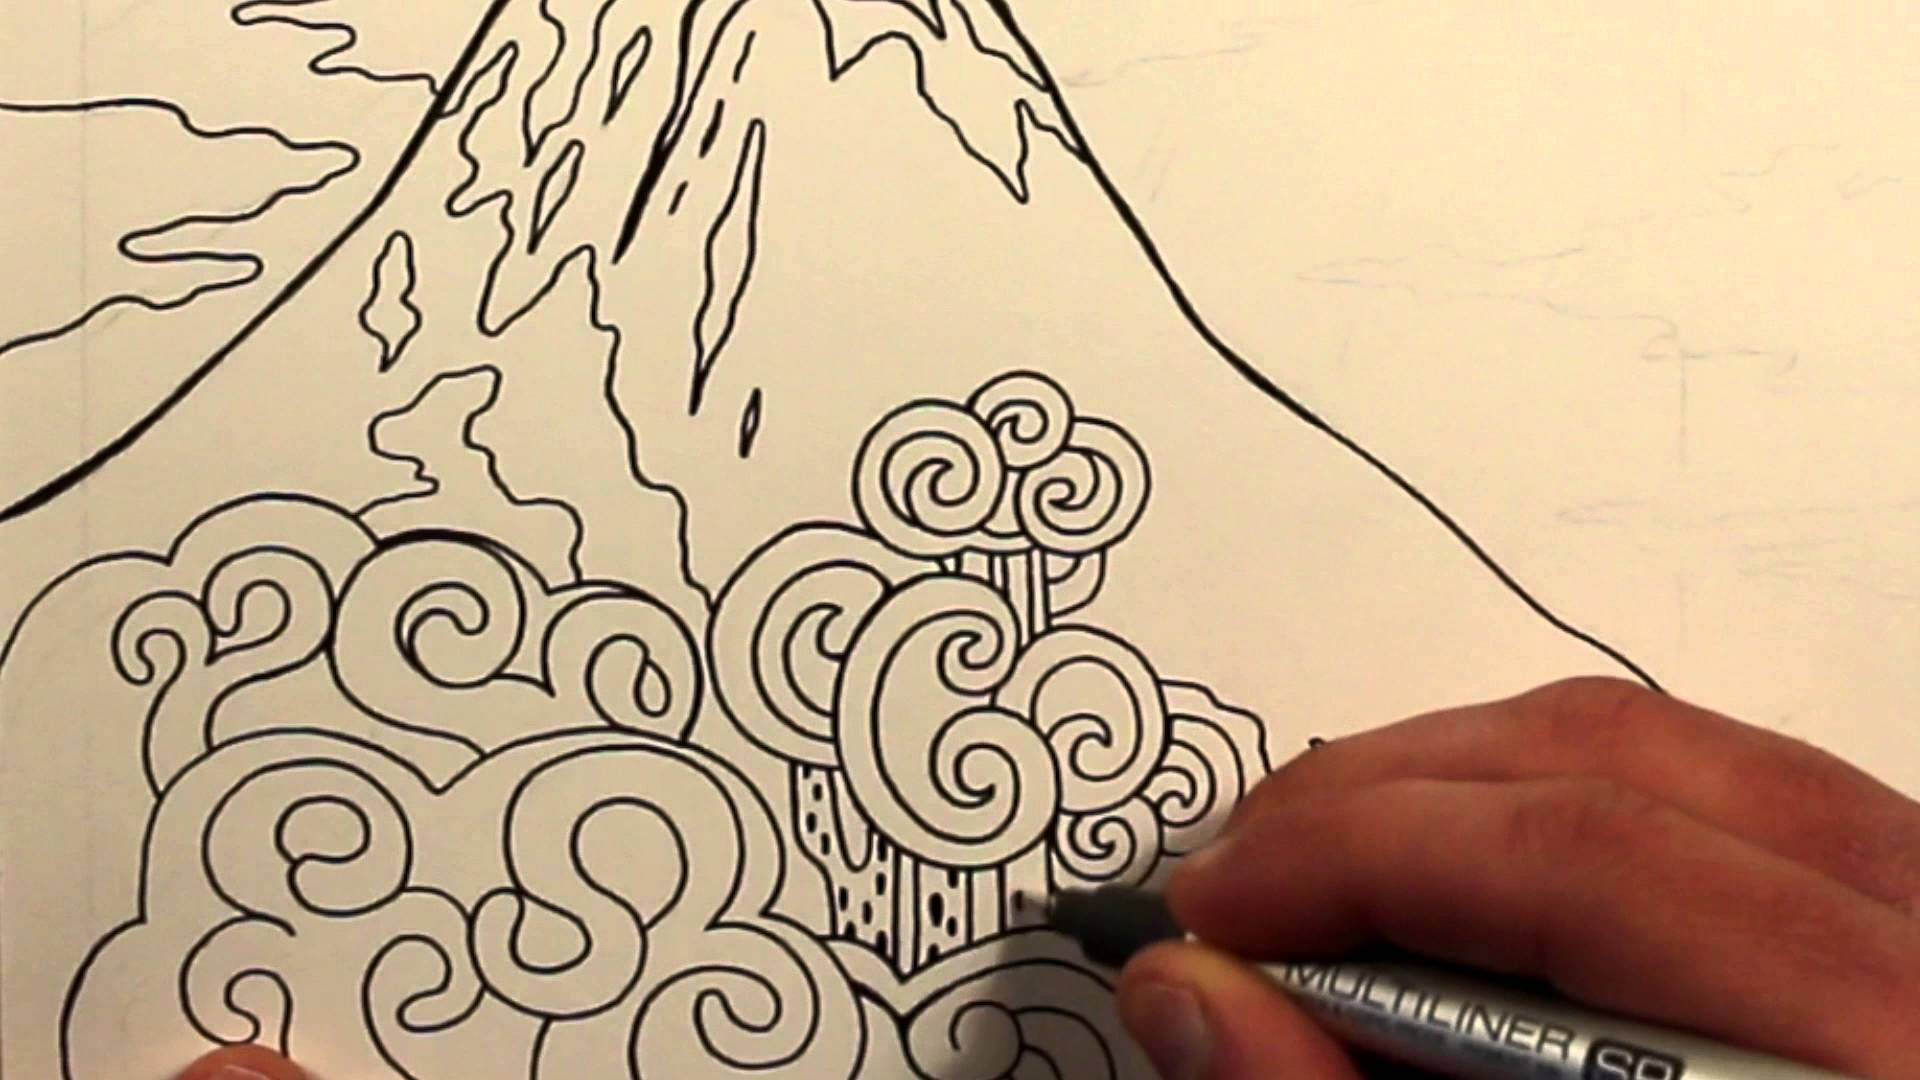 Drawn volcano volcano eruption An An Erupting Drawing Volcano